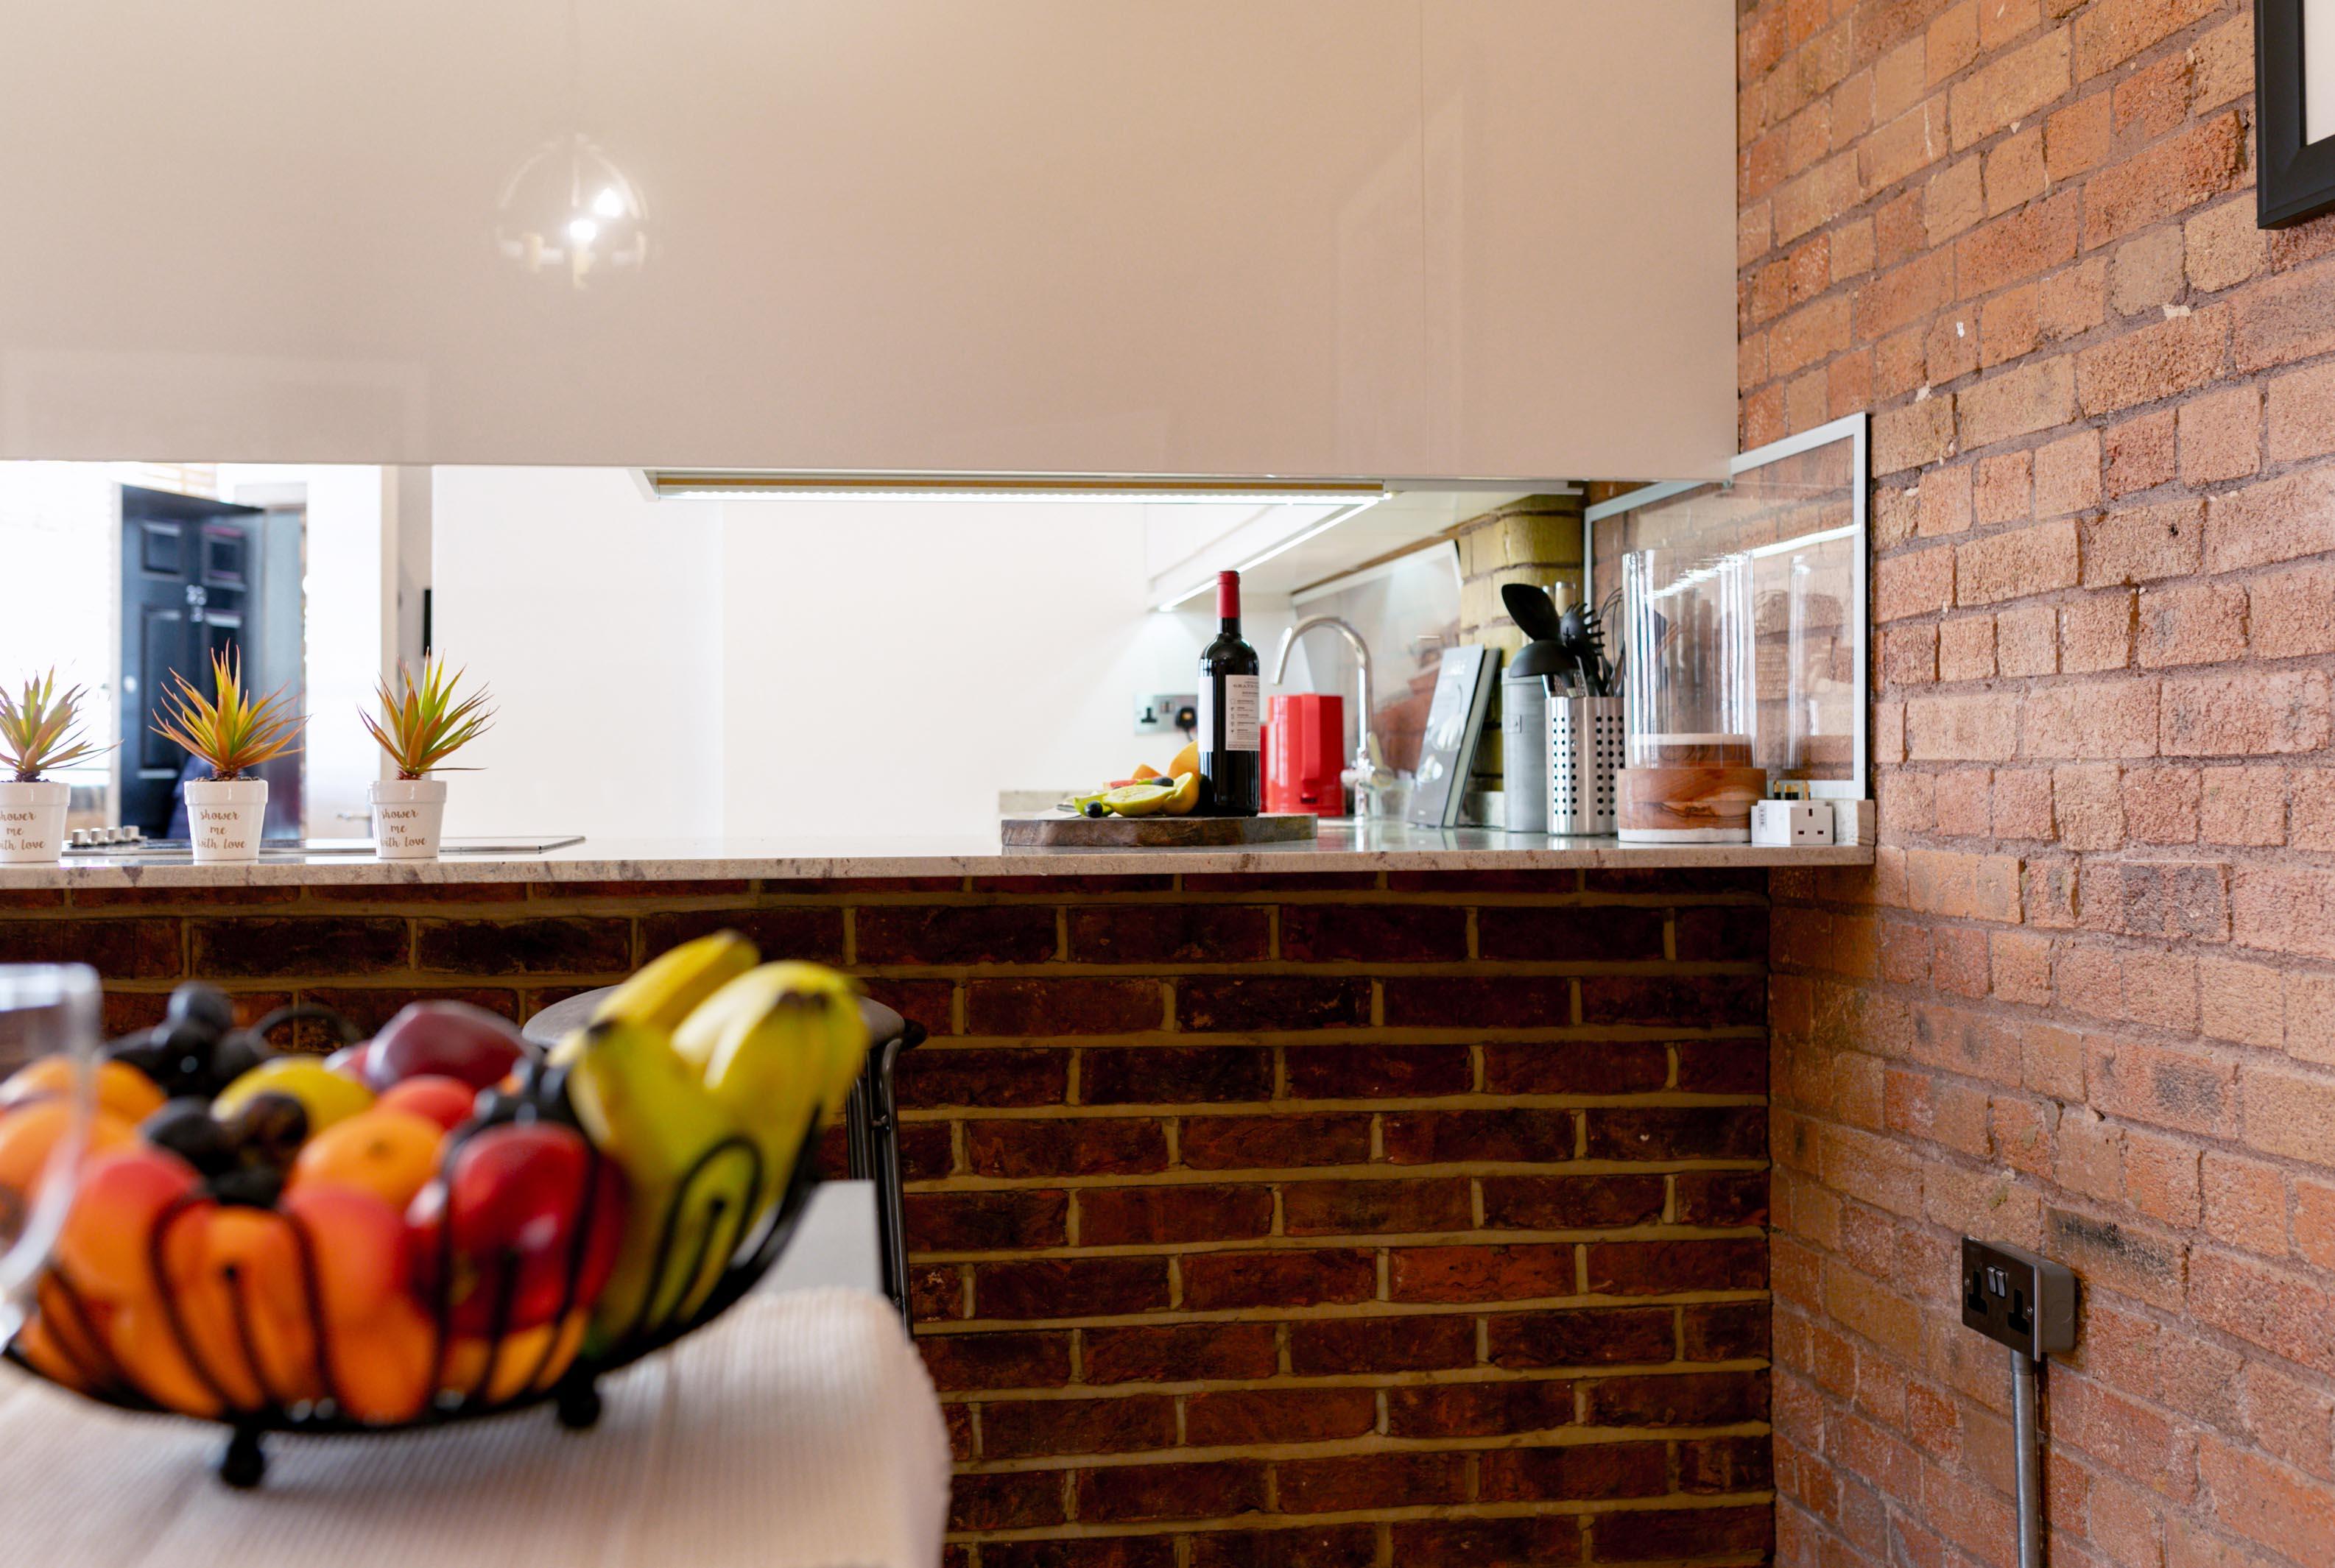 Lovelydays luxury service apartment rental - London - Fitzrovia - Wells Mews B - Lovelysuite - 2 bedrooms - 2 bathrooms - Luxury kitchen - d92ed68d00ae - Lovelydays